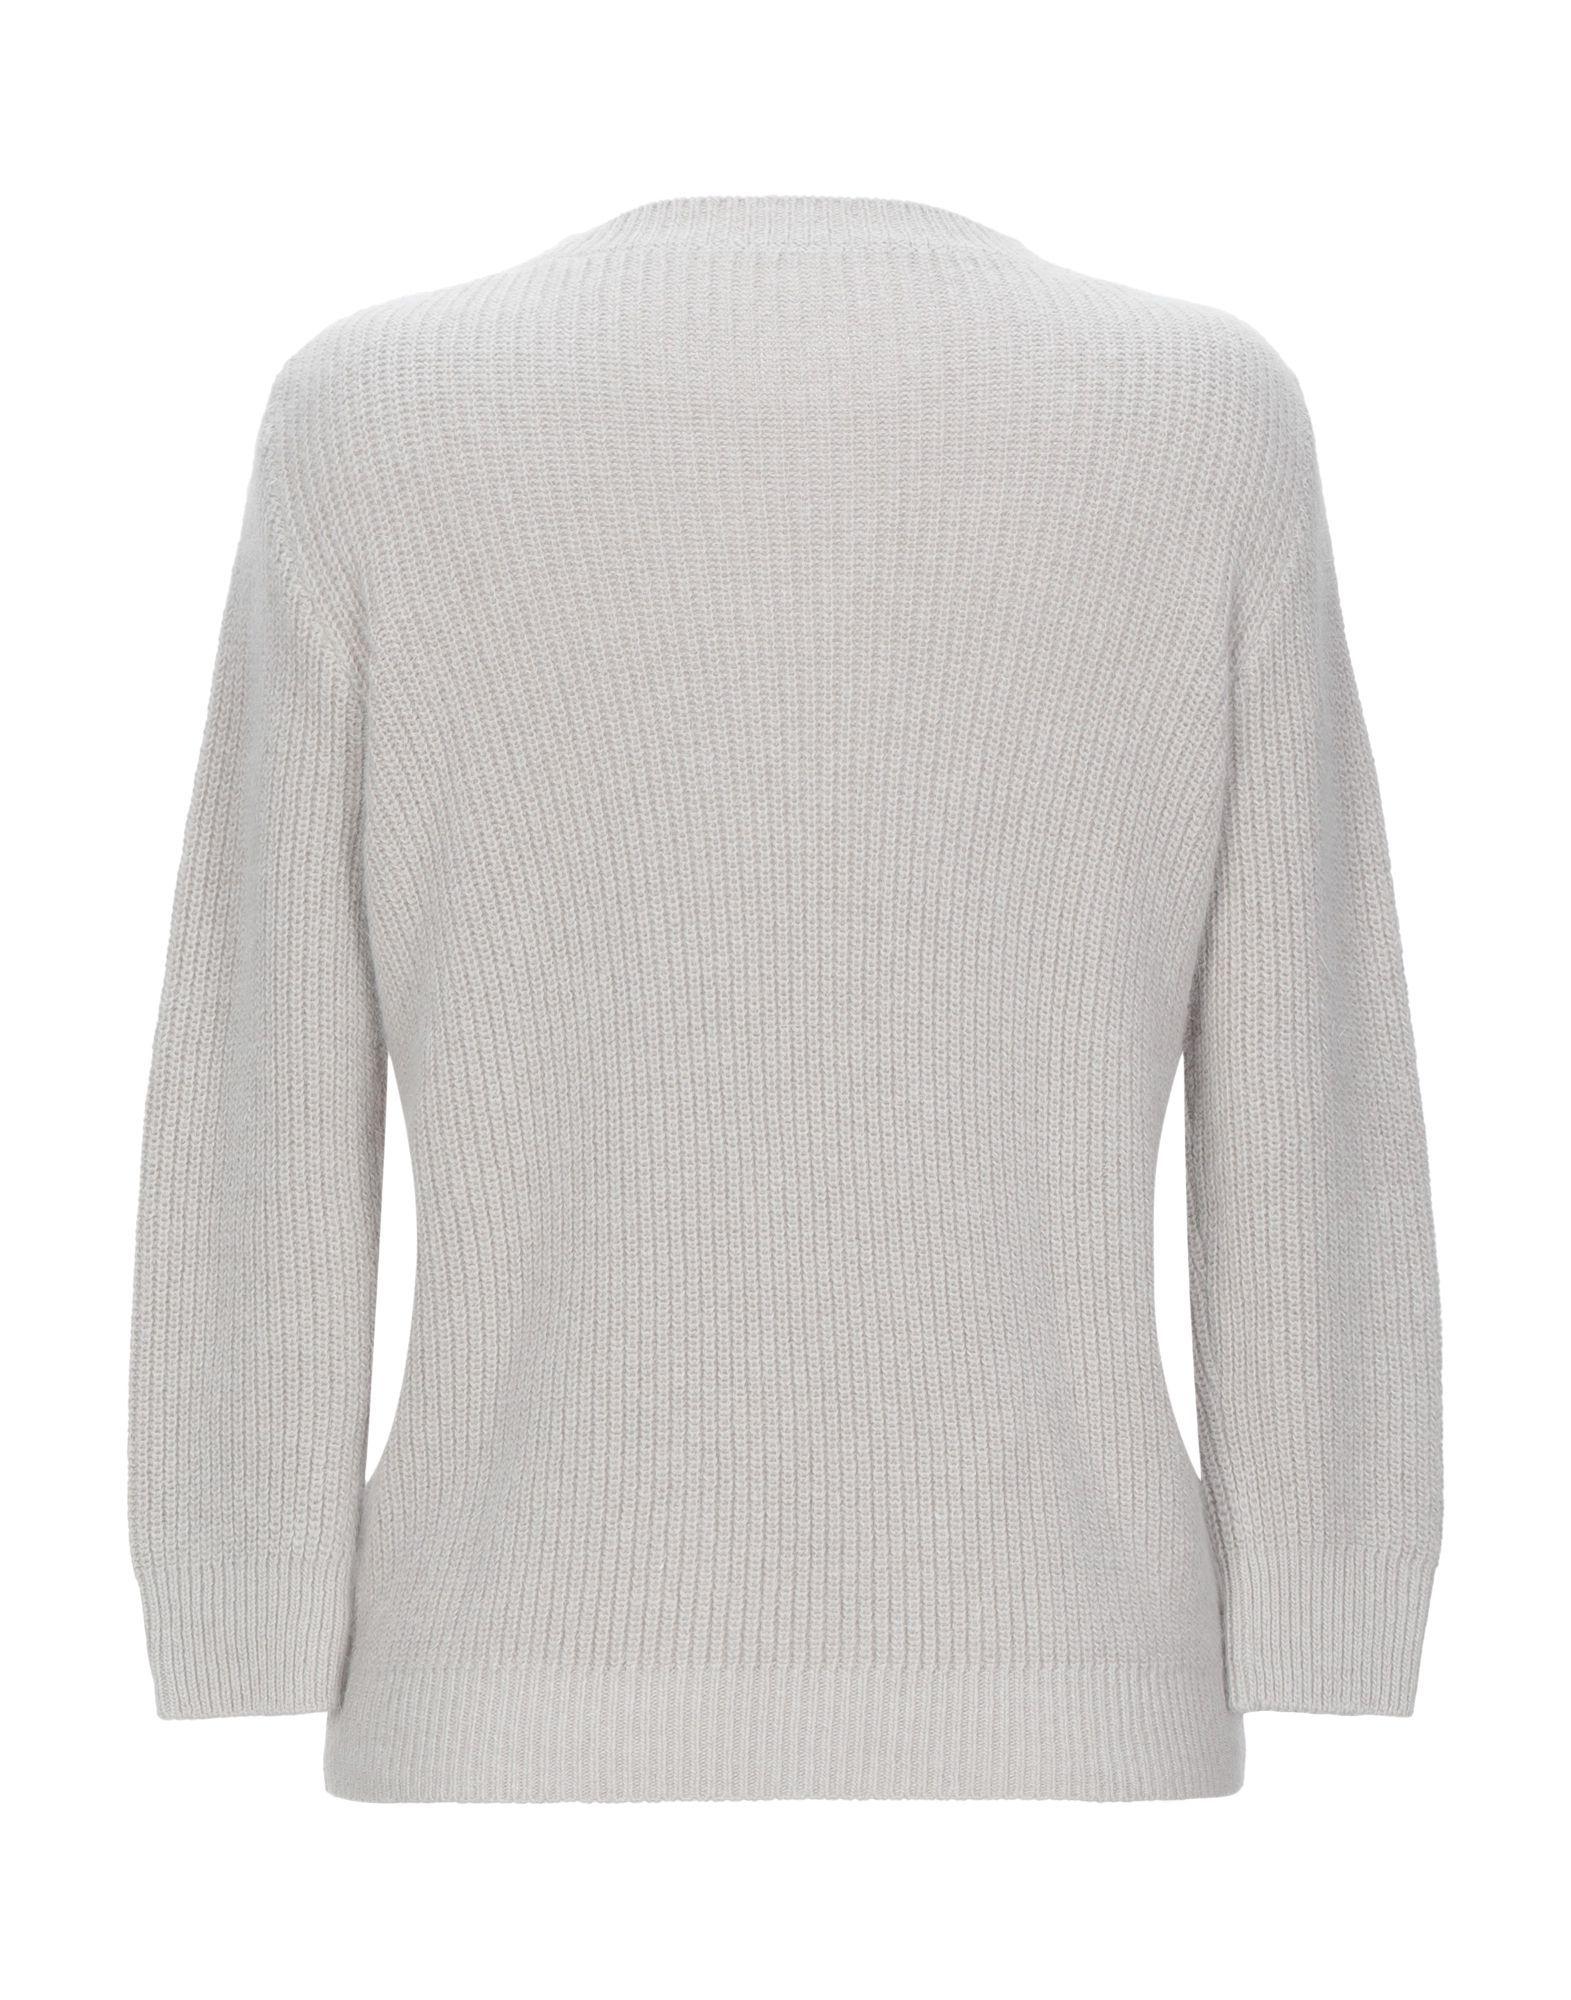 Emporio Armani Light Grey Angora Knit Jumper